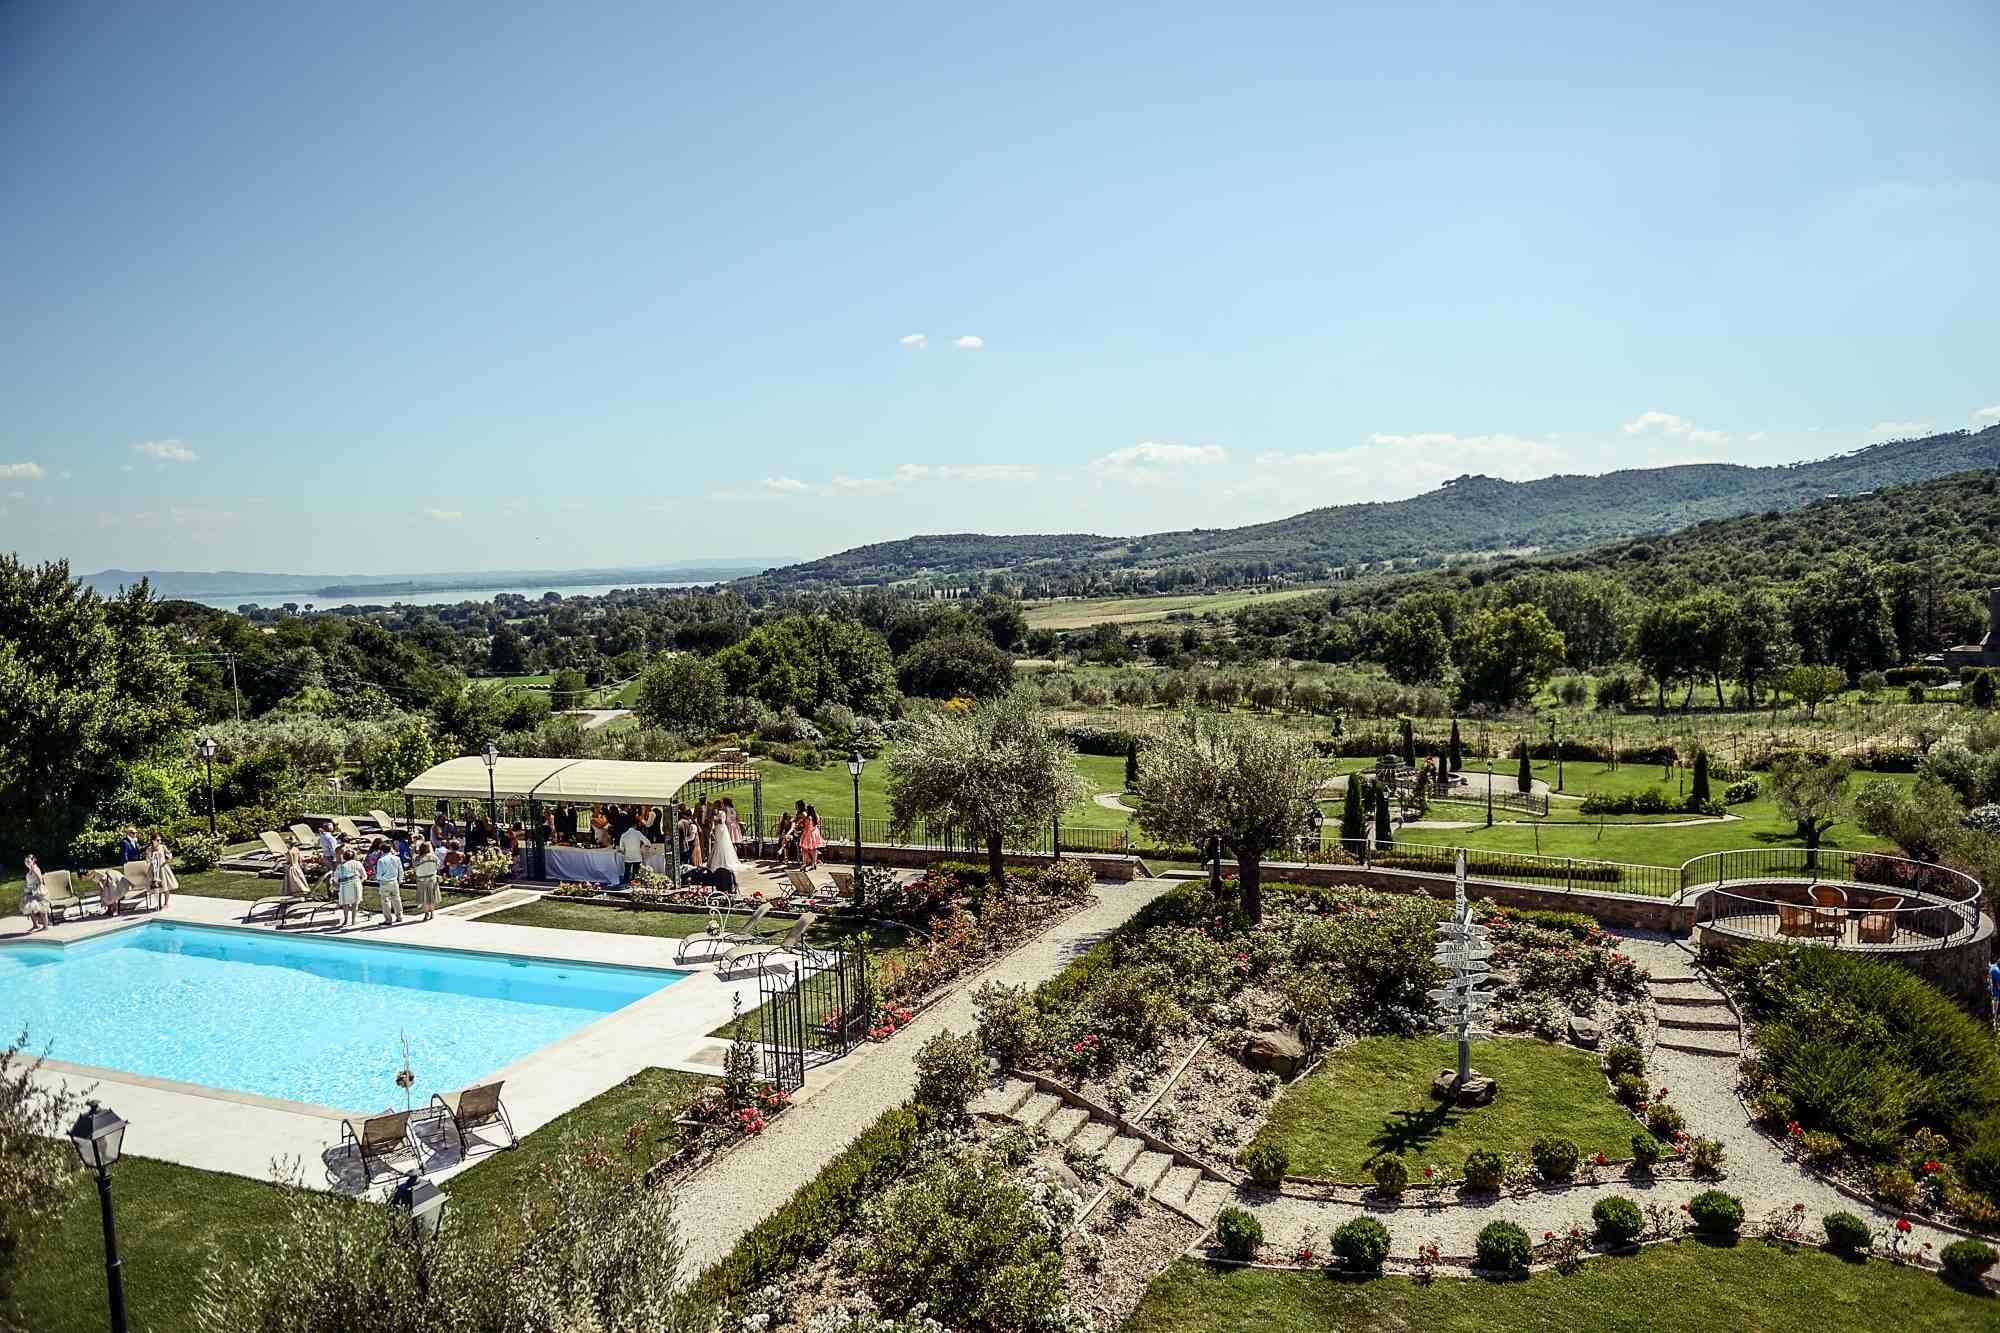 Italy Villa Sleeps 40 50 People Luxury Accommodations In